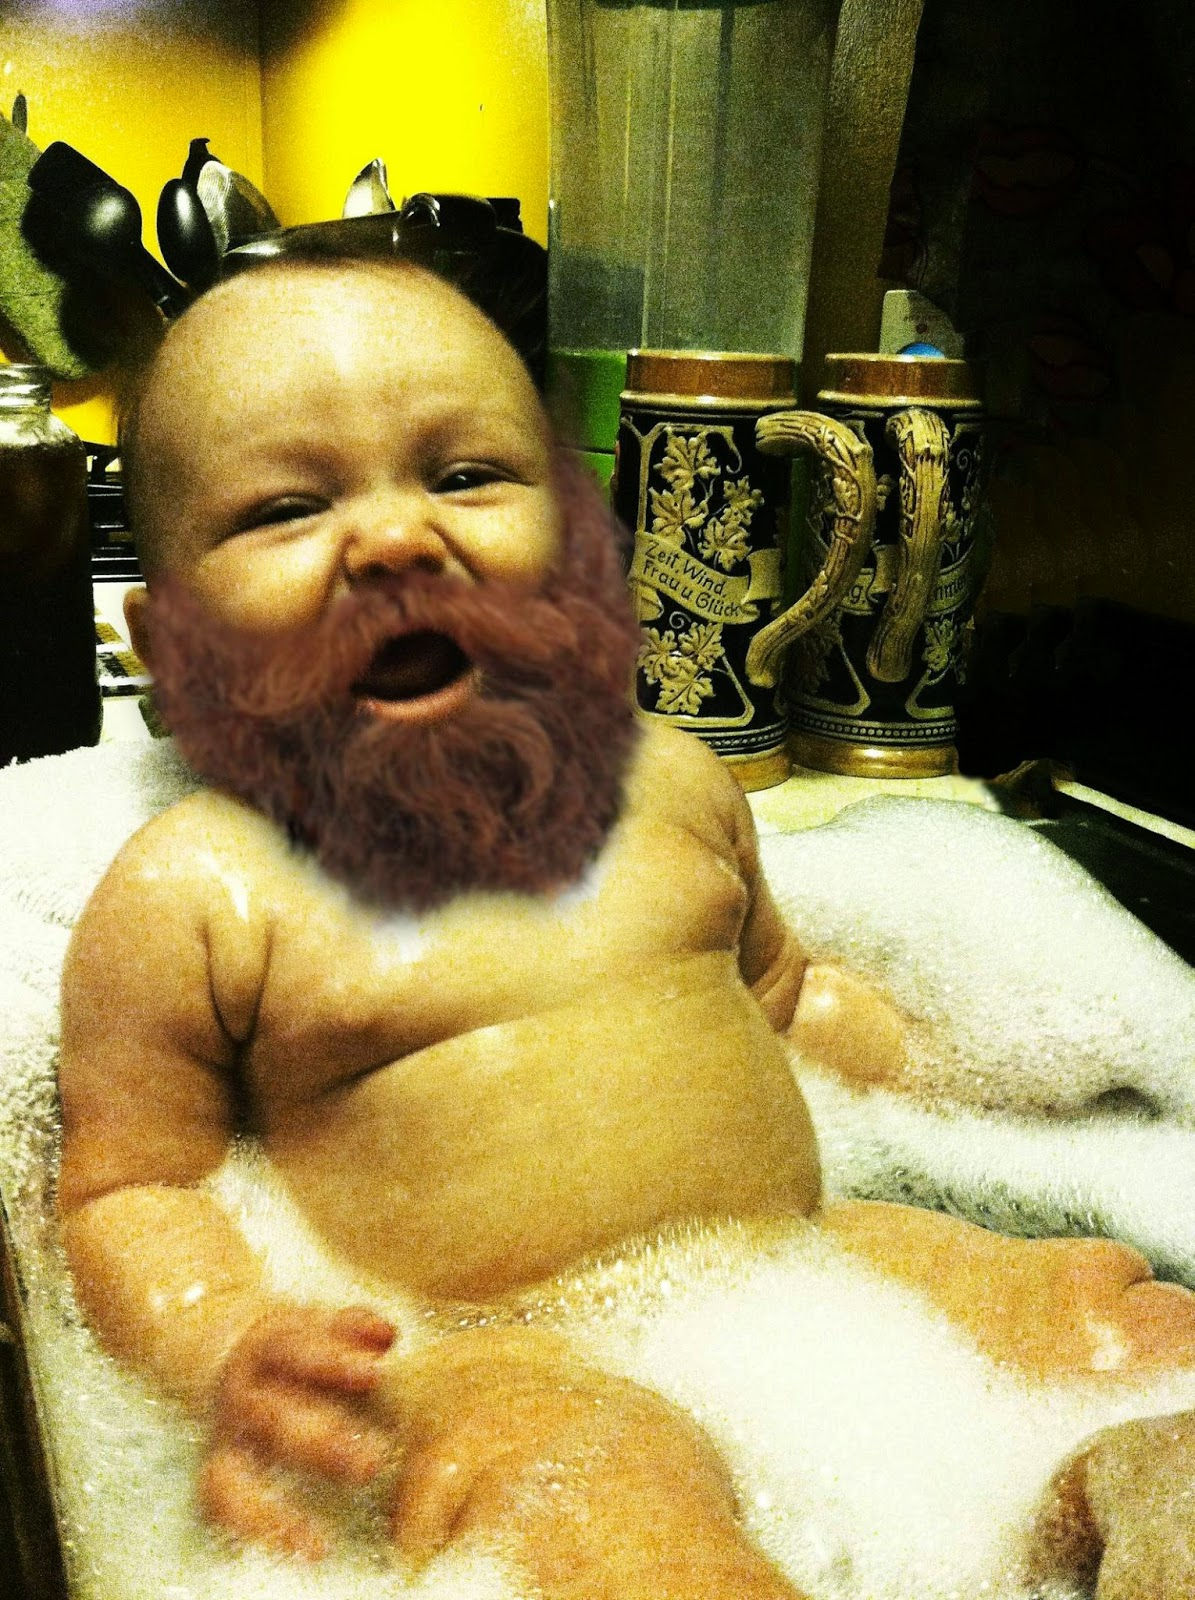 Gambar bayi lucu dan gokil berjenggot